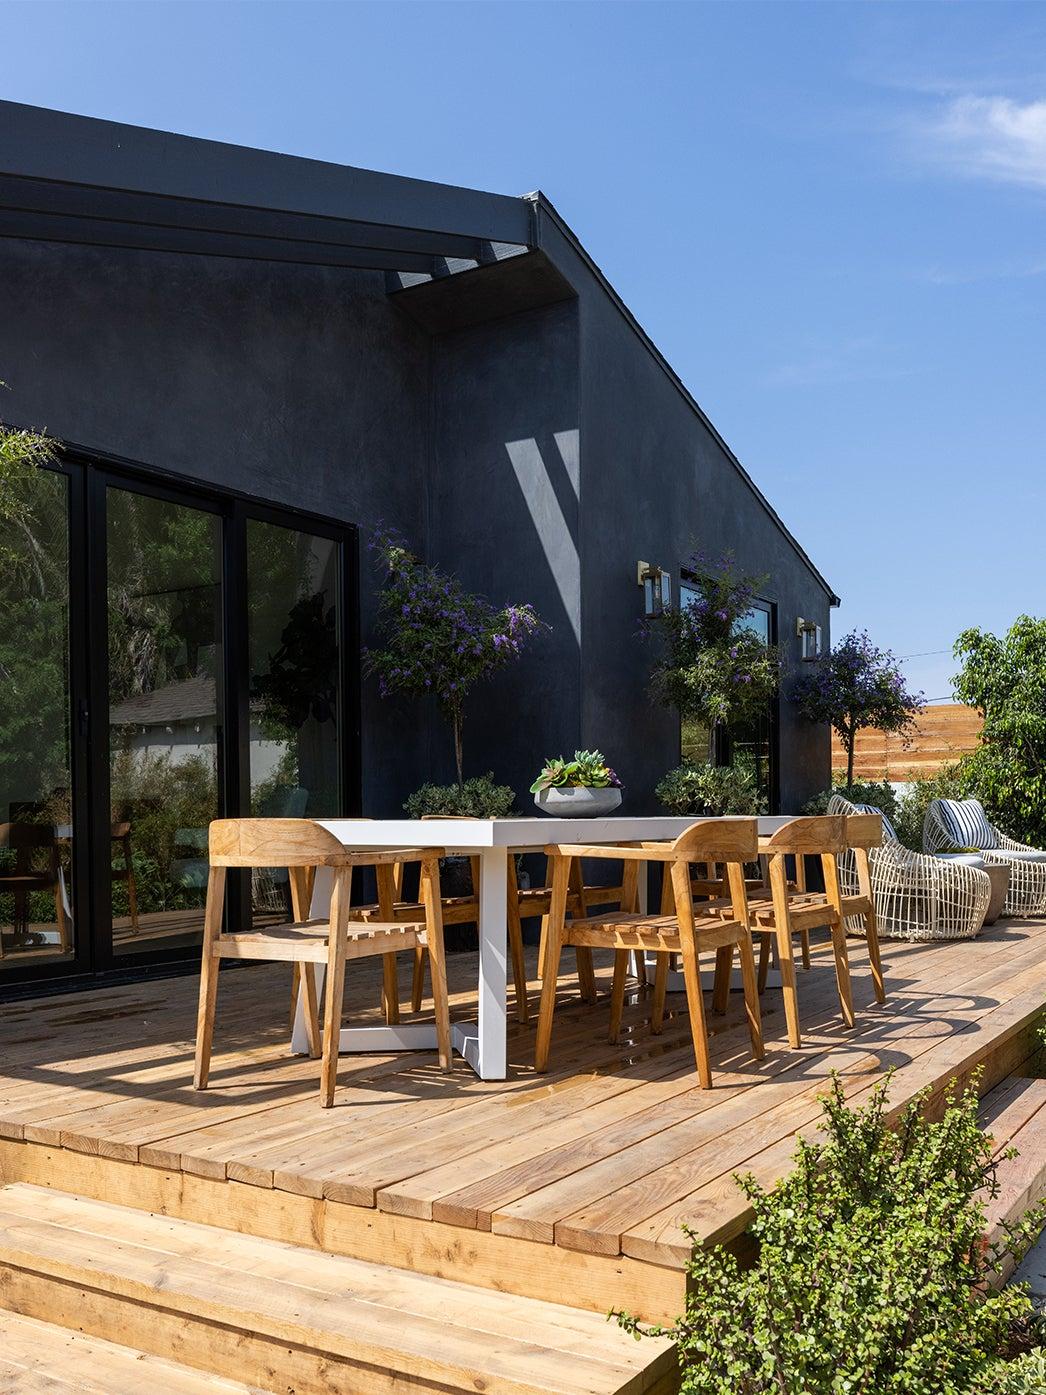 00-FEATURE-dark-exterior-home-renovation-domino